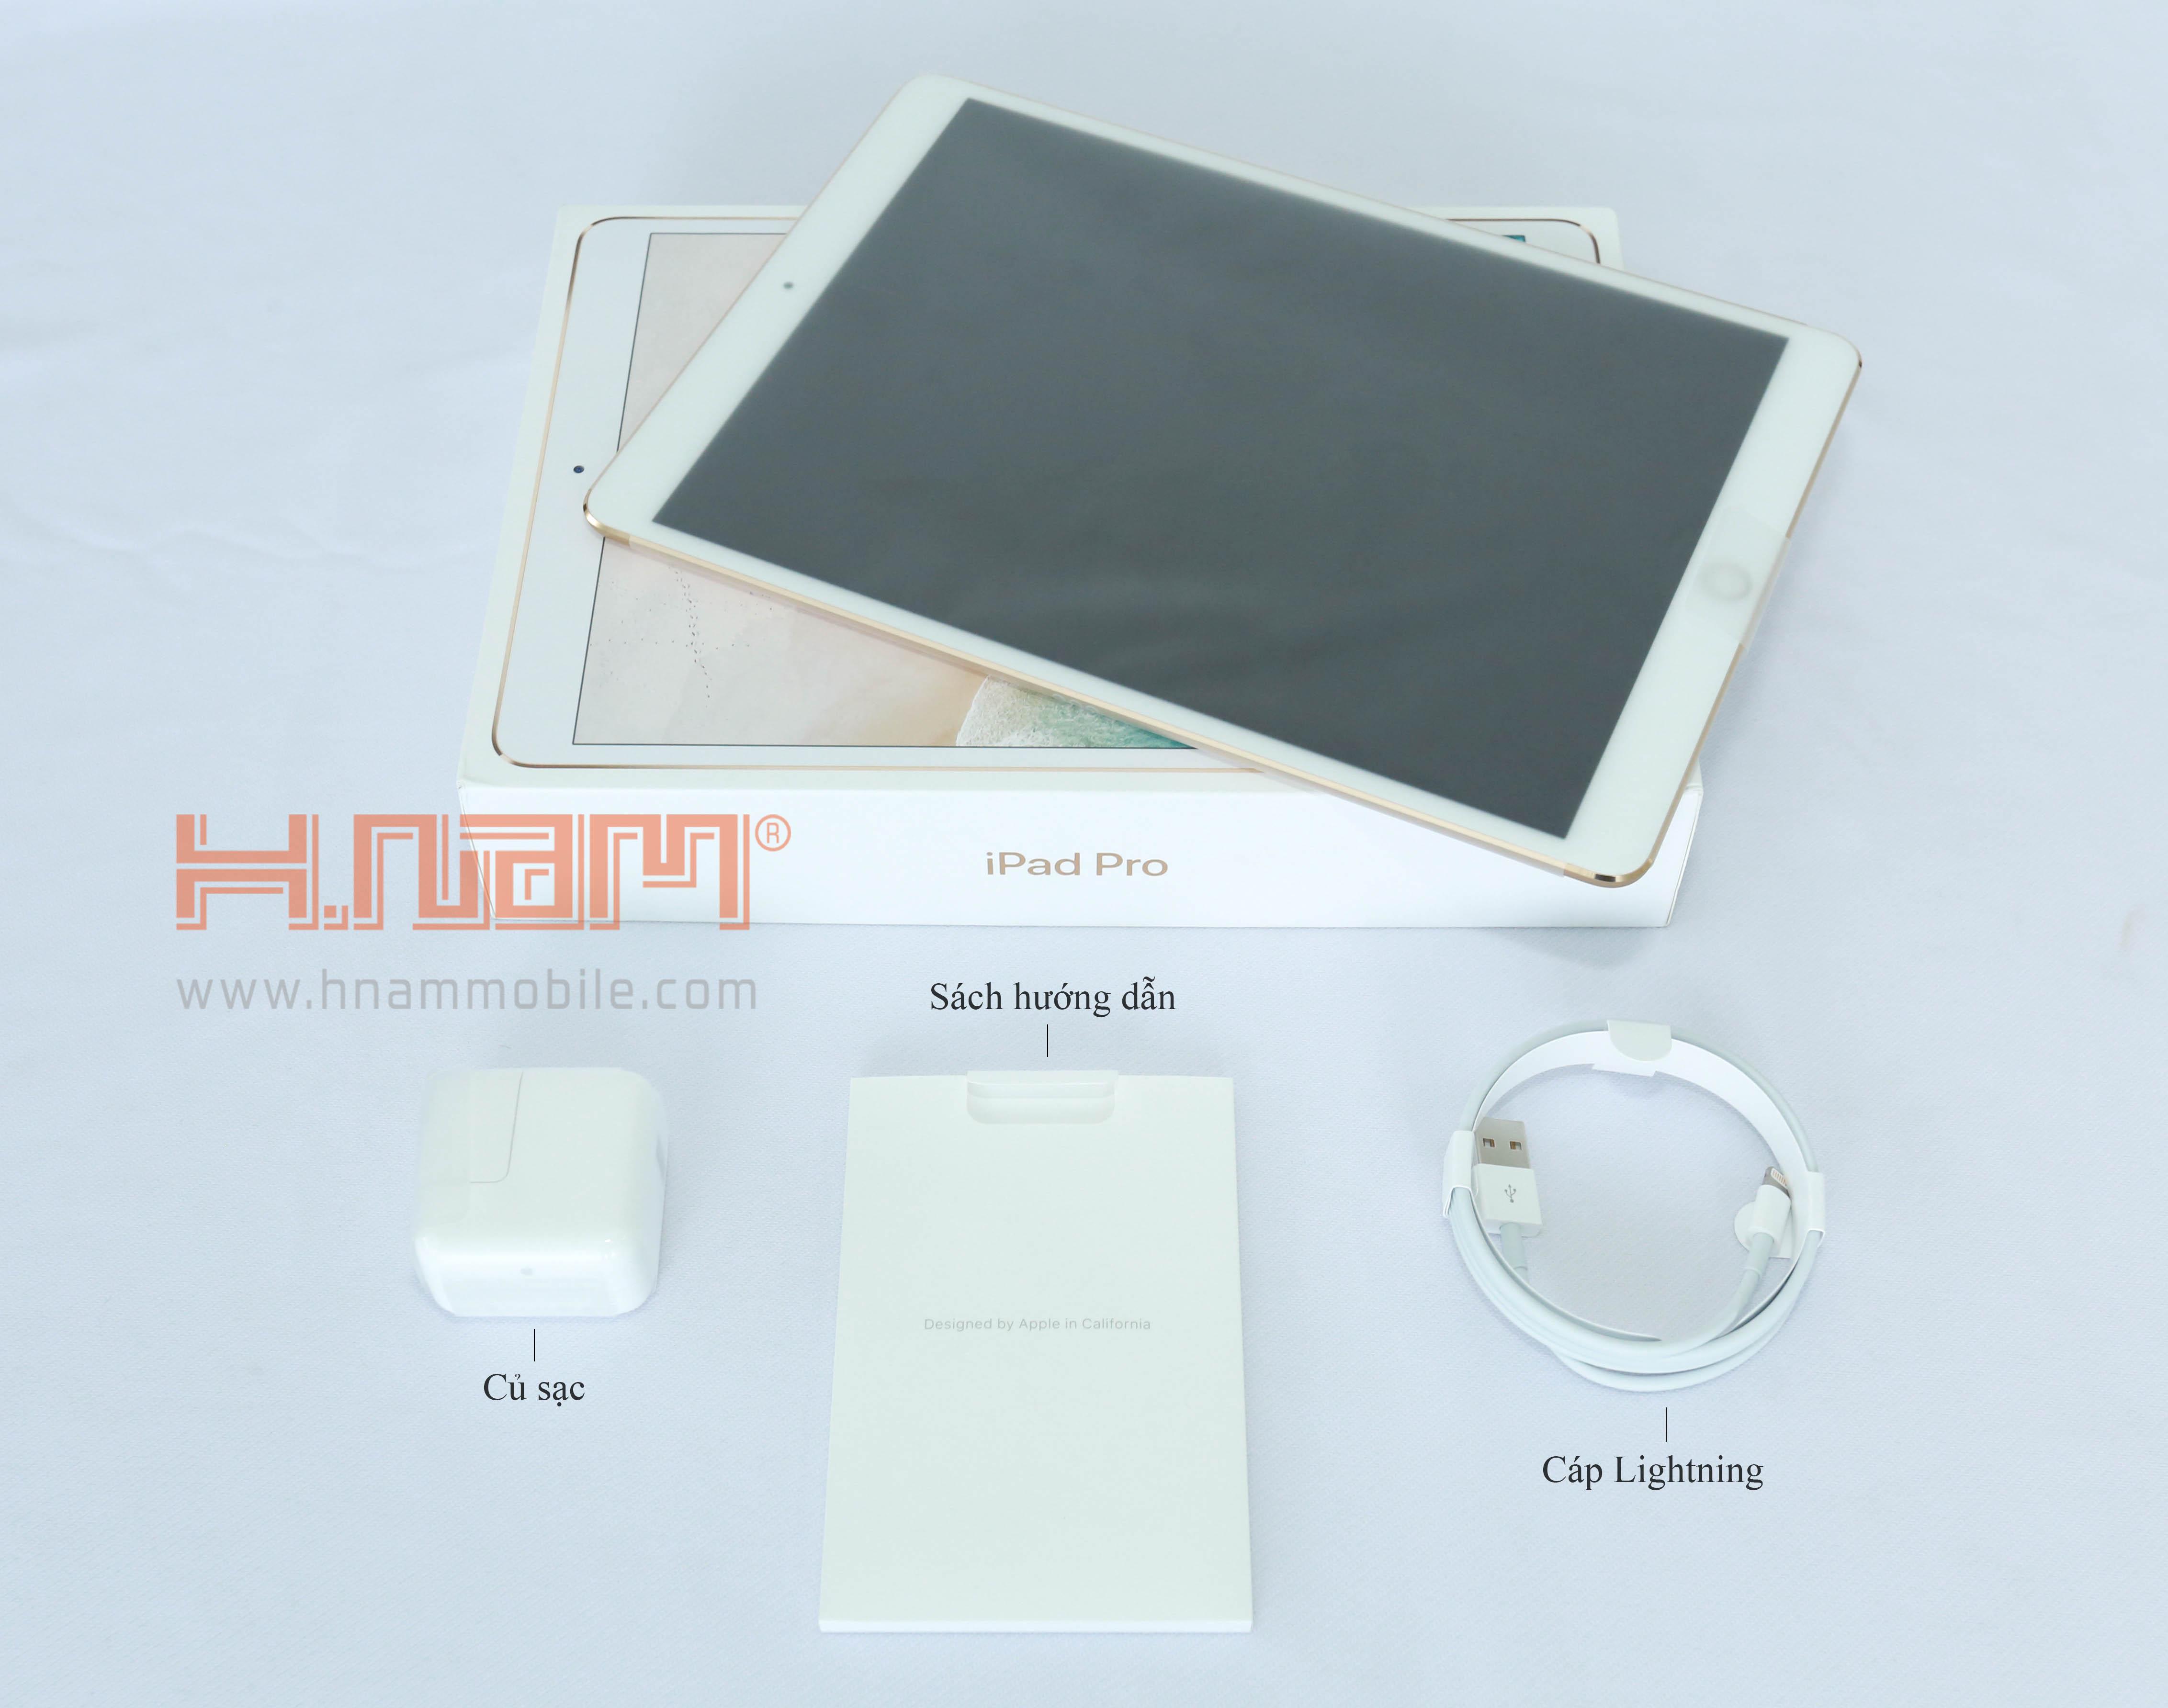 Apple iPad Pro 12.9 Wi-Fi 64Gb 2017 hình sản phẩm 0